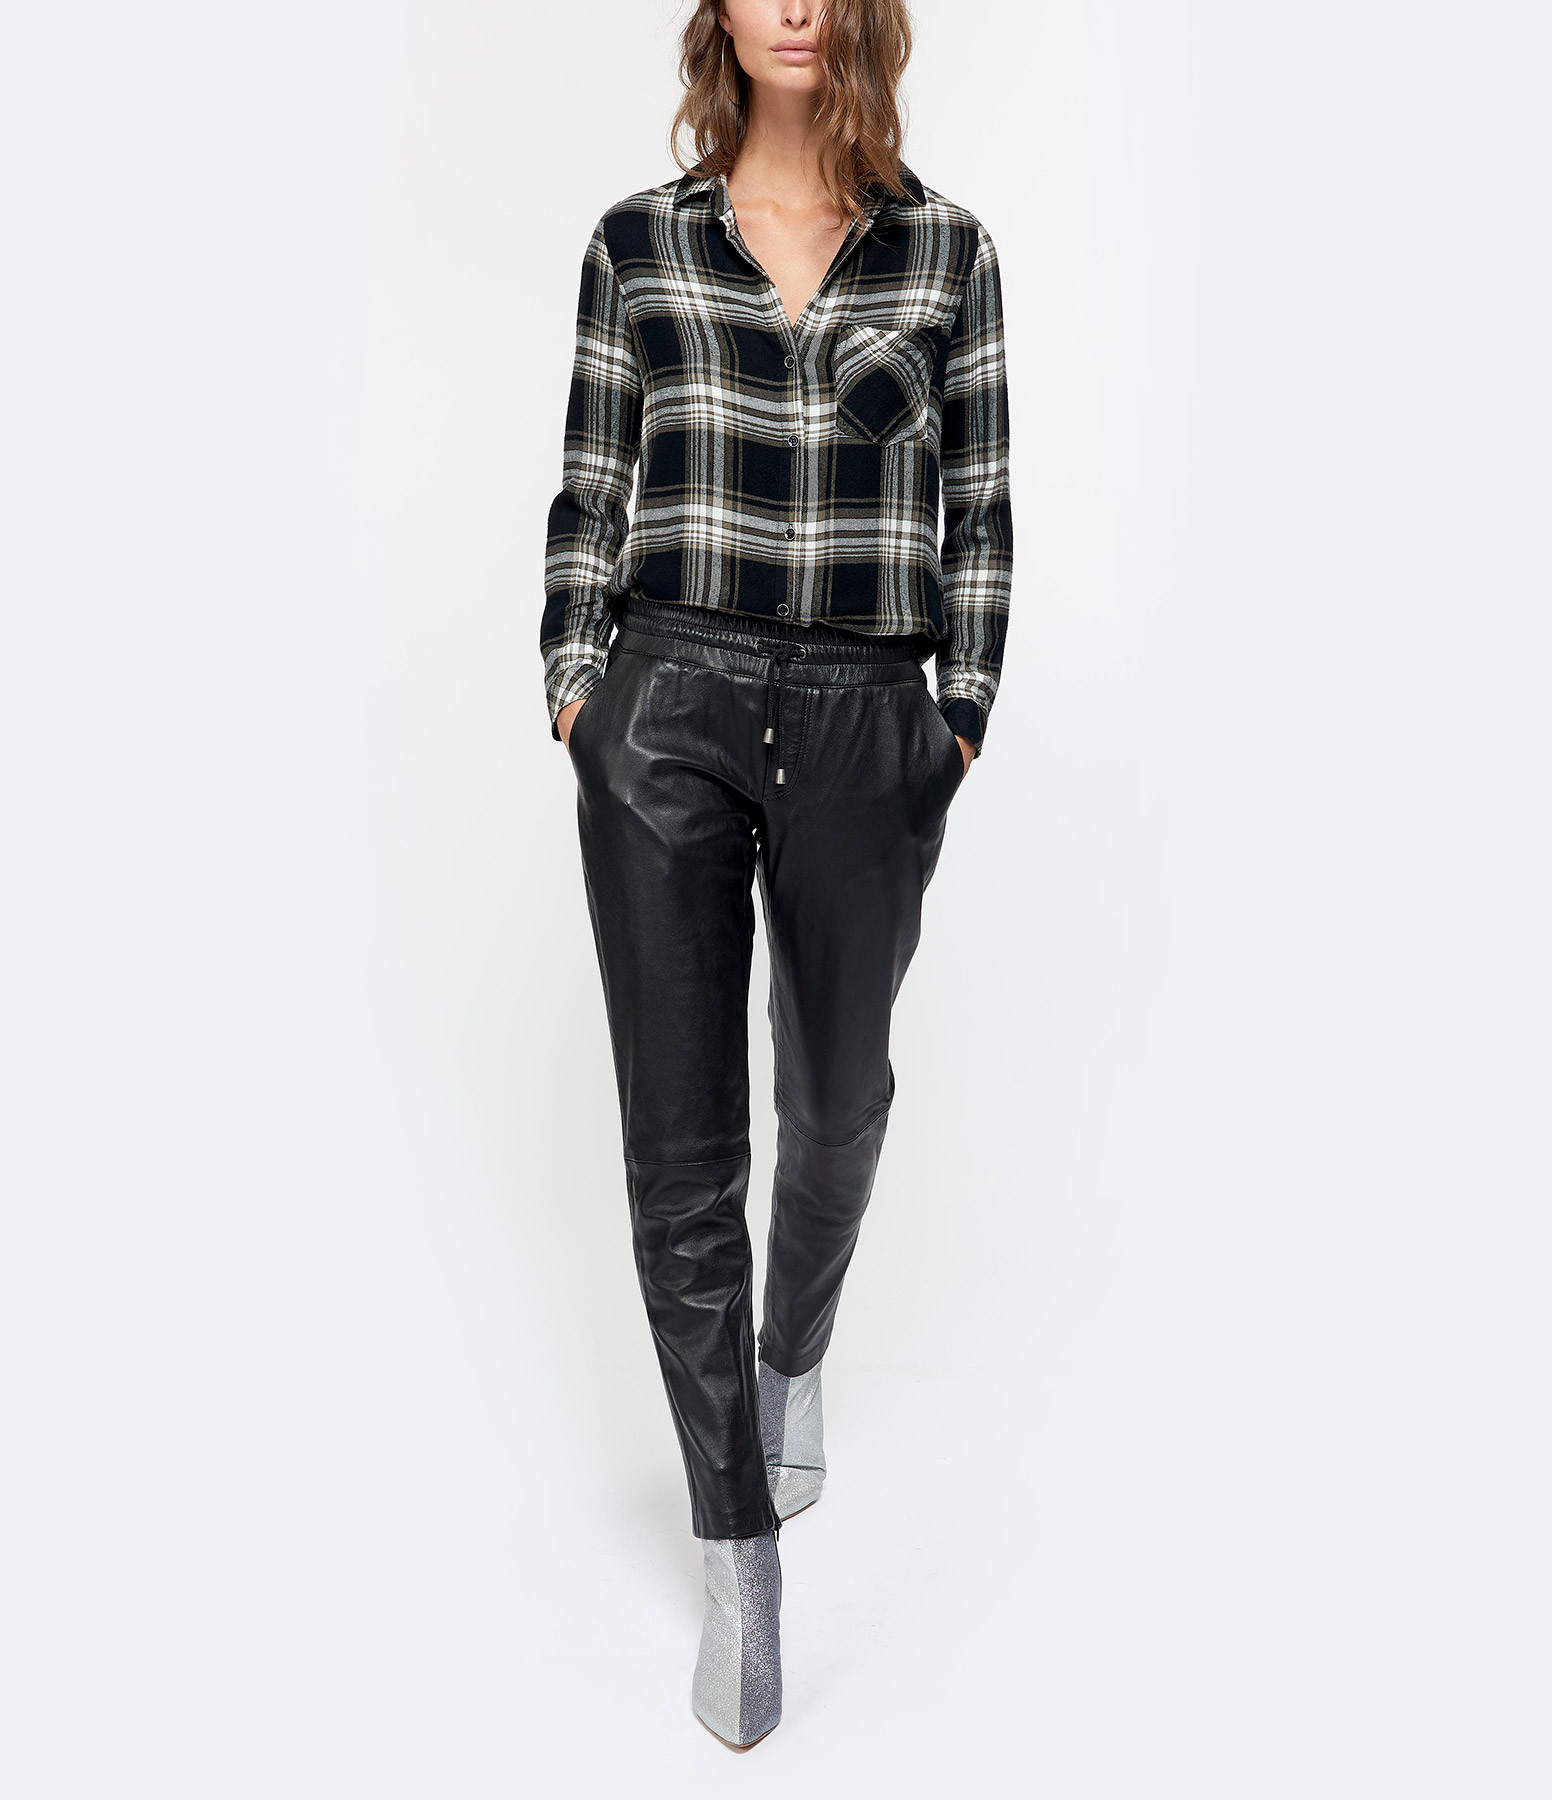 MUUBAA - Pantalon Malaxis Cuir Noir